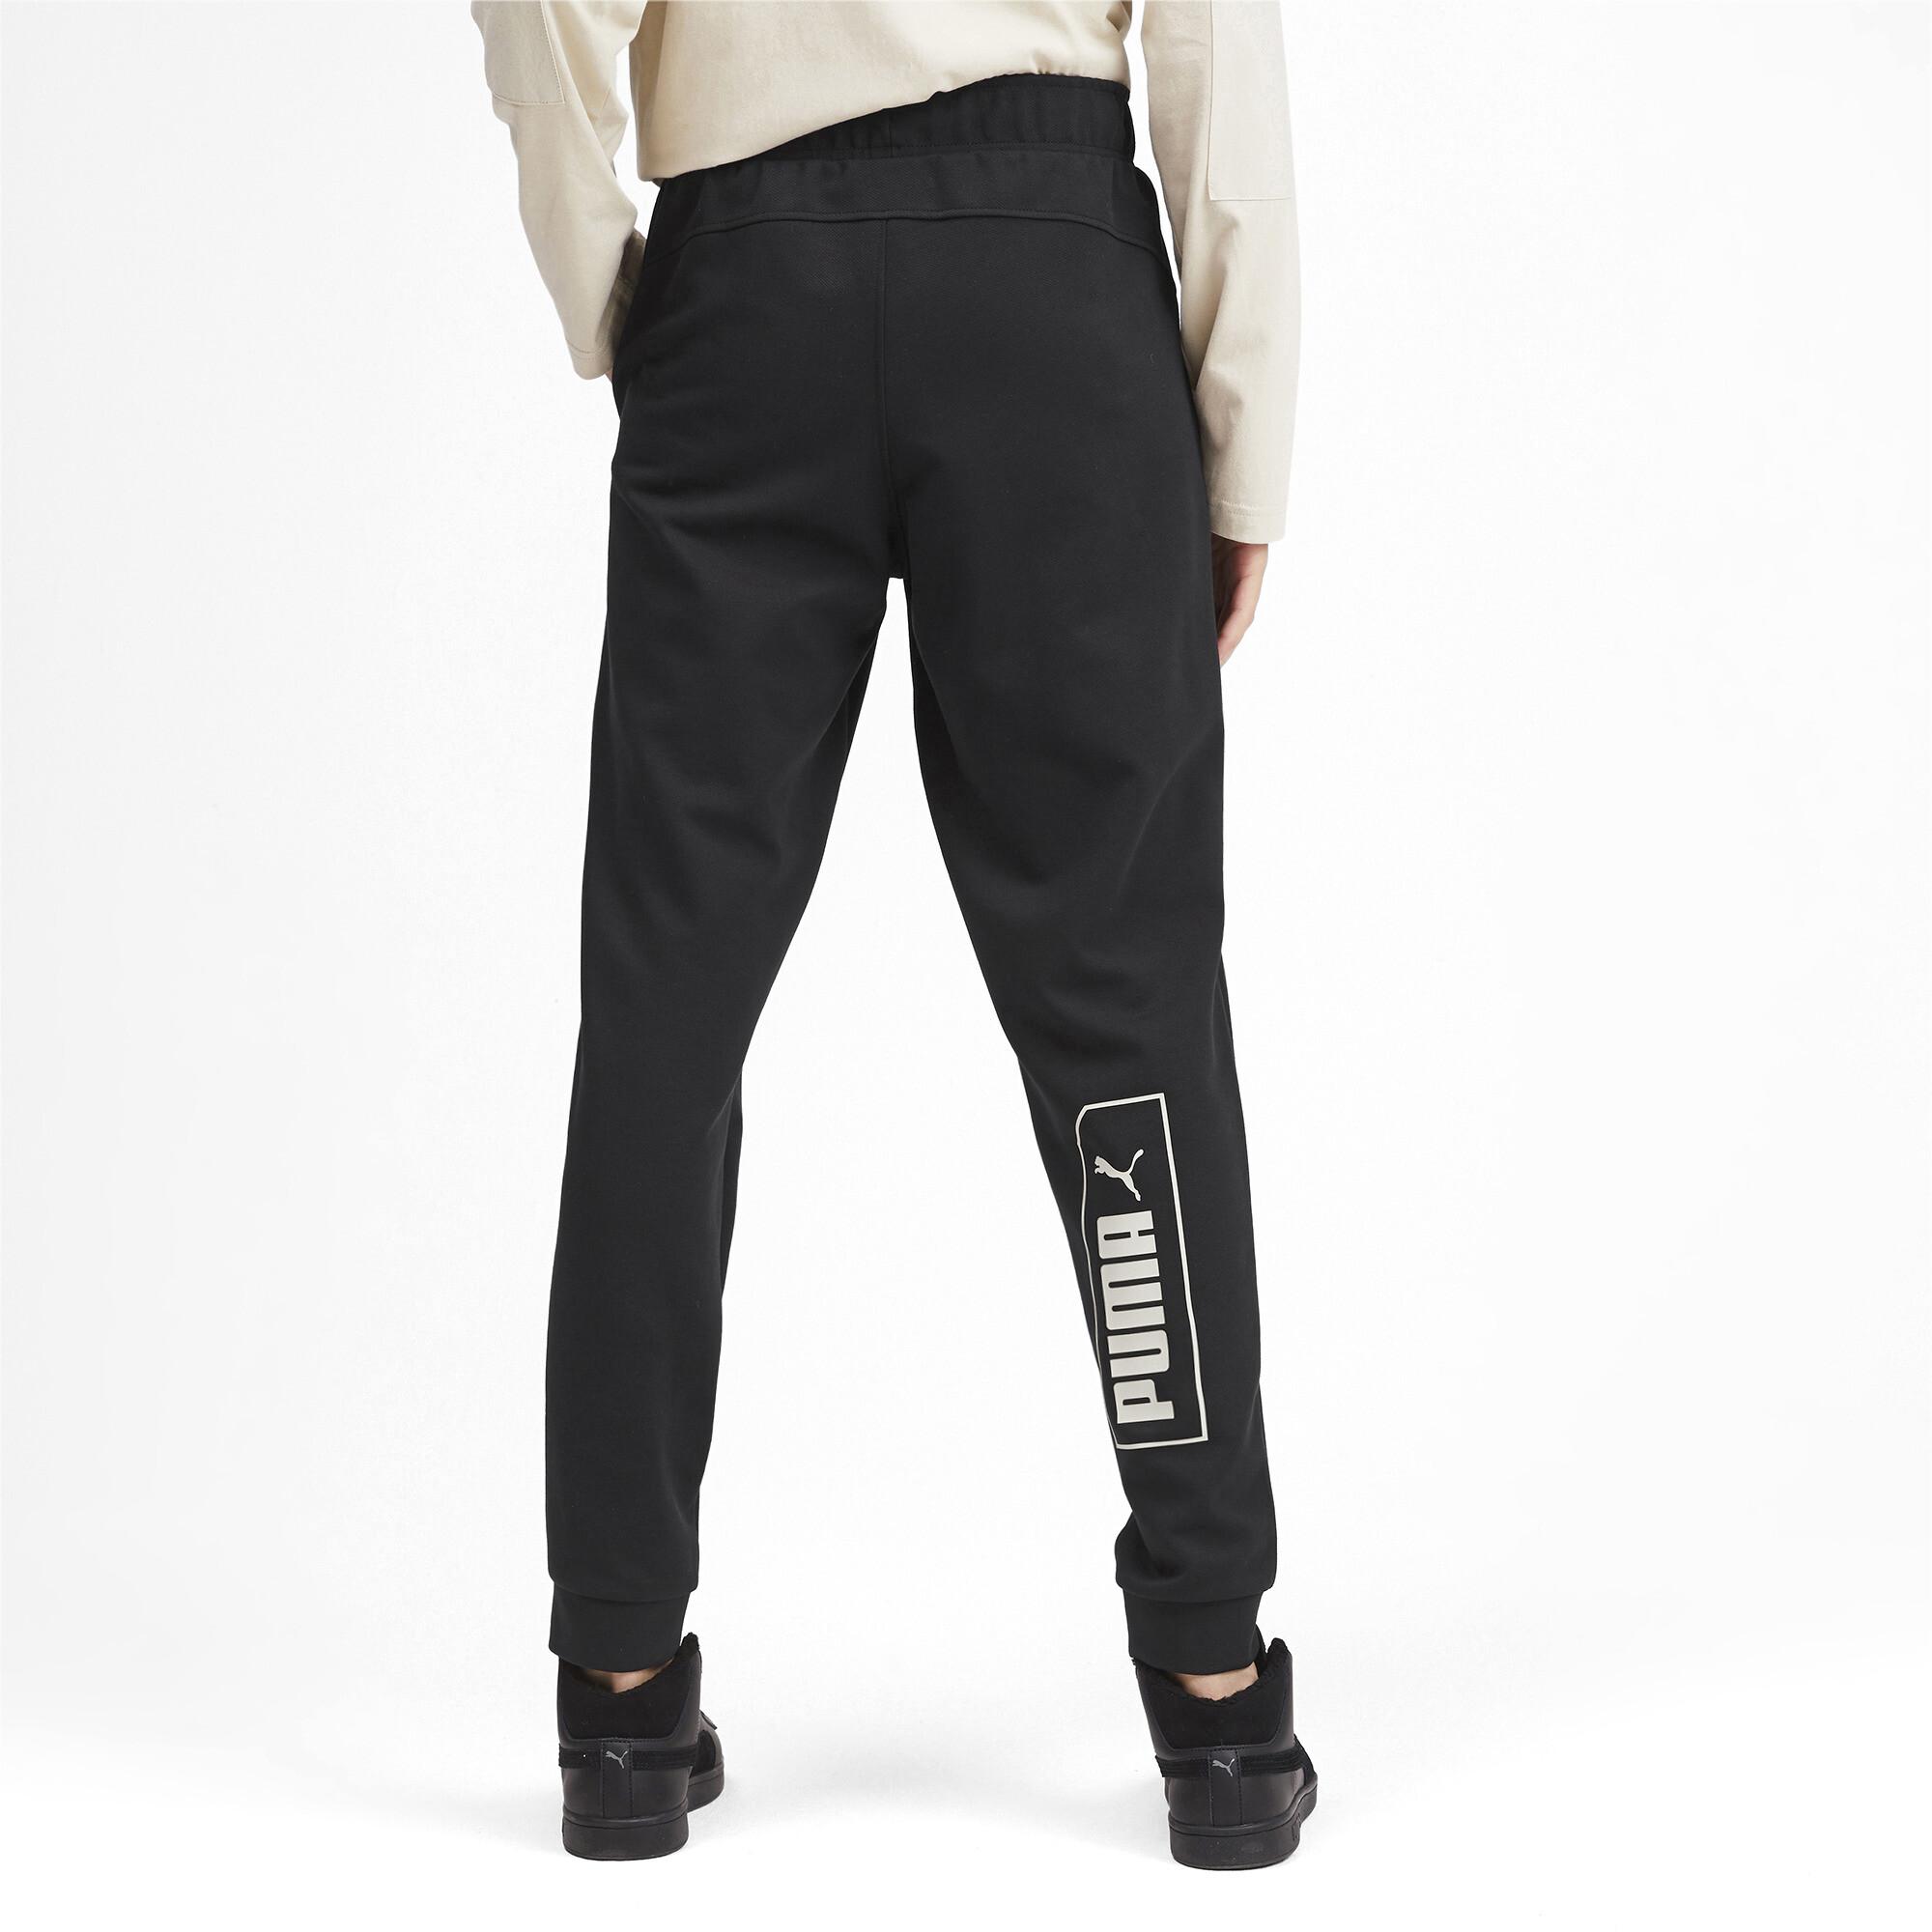 PUMA-NU-TILITY-Men-039-s-Sweatpants-Men-Knitted-Pants-Basics thumbnail 15